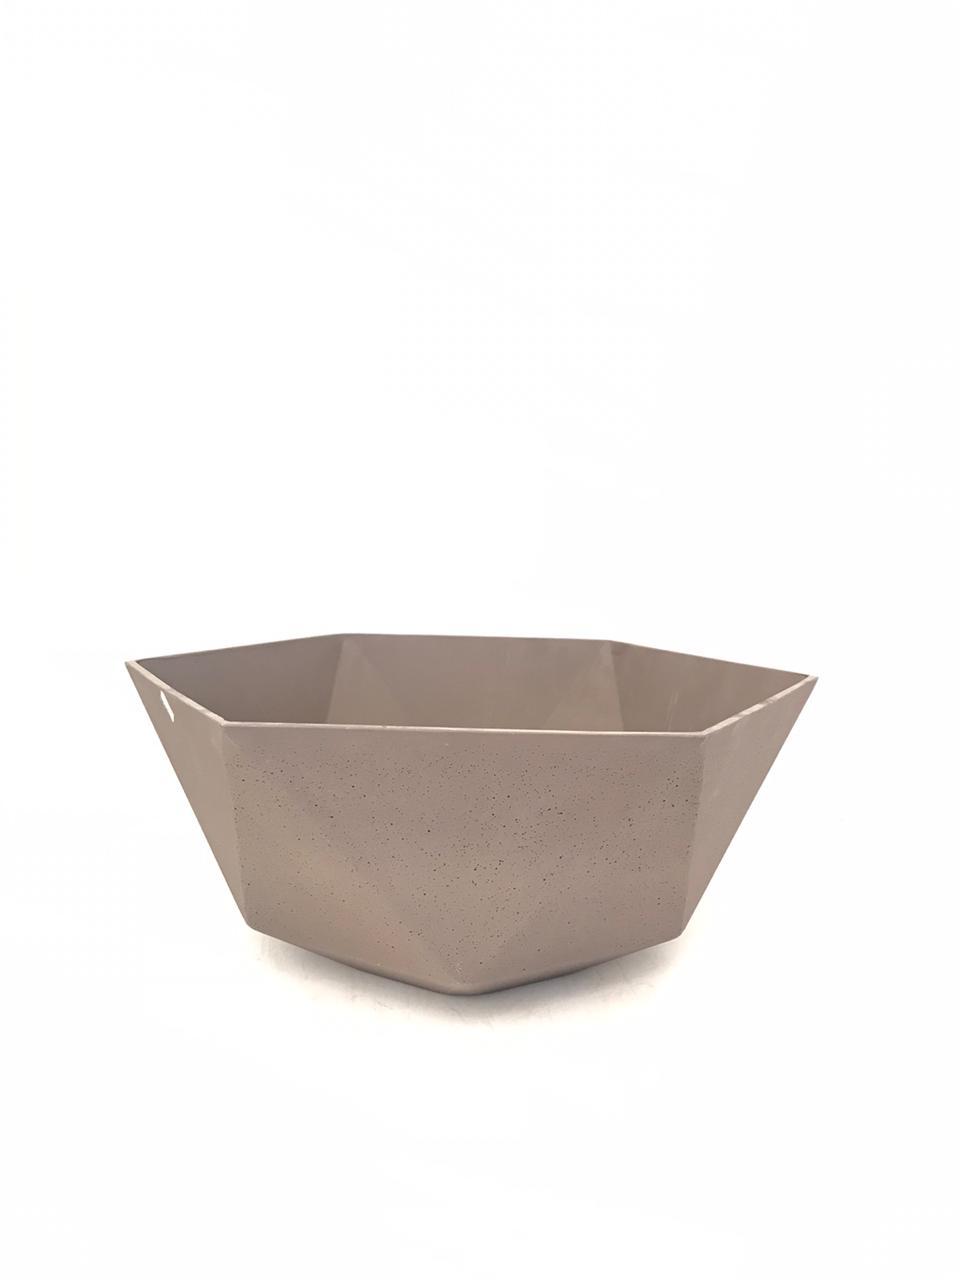 Sandstone Pot Hex Brown Medium Pots & Vases